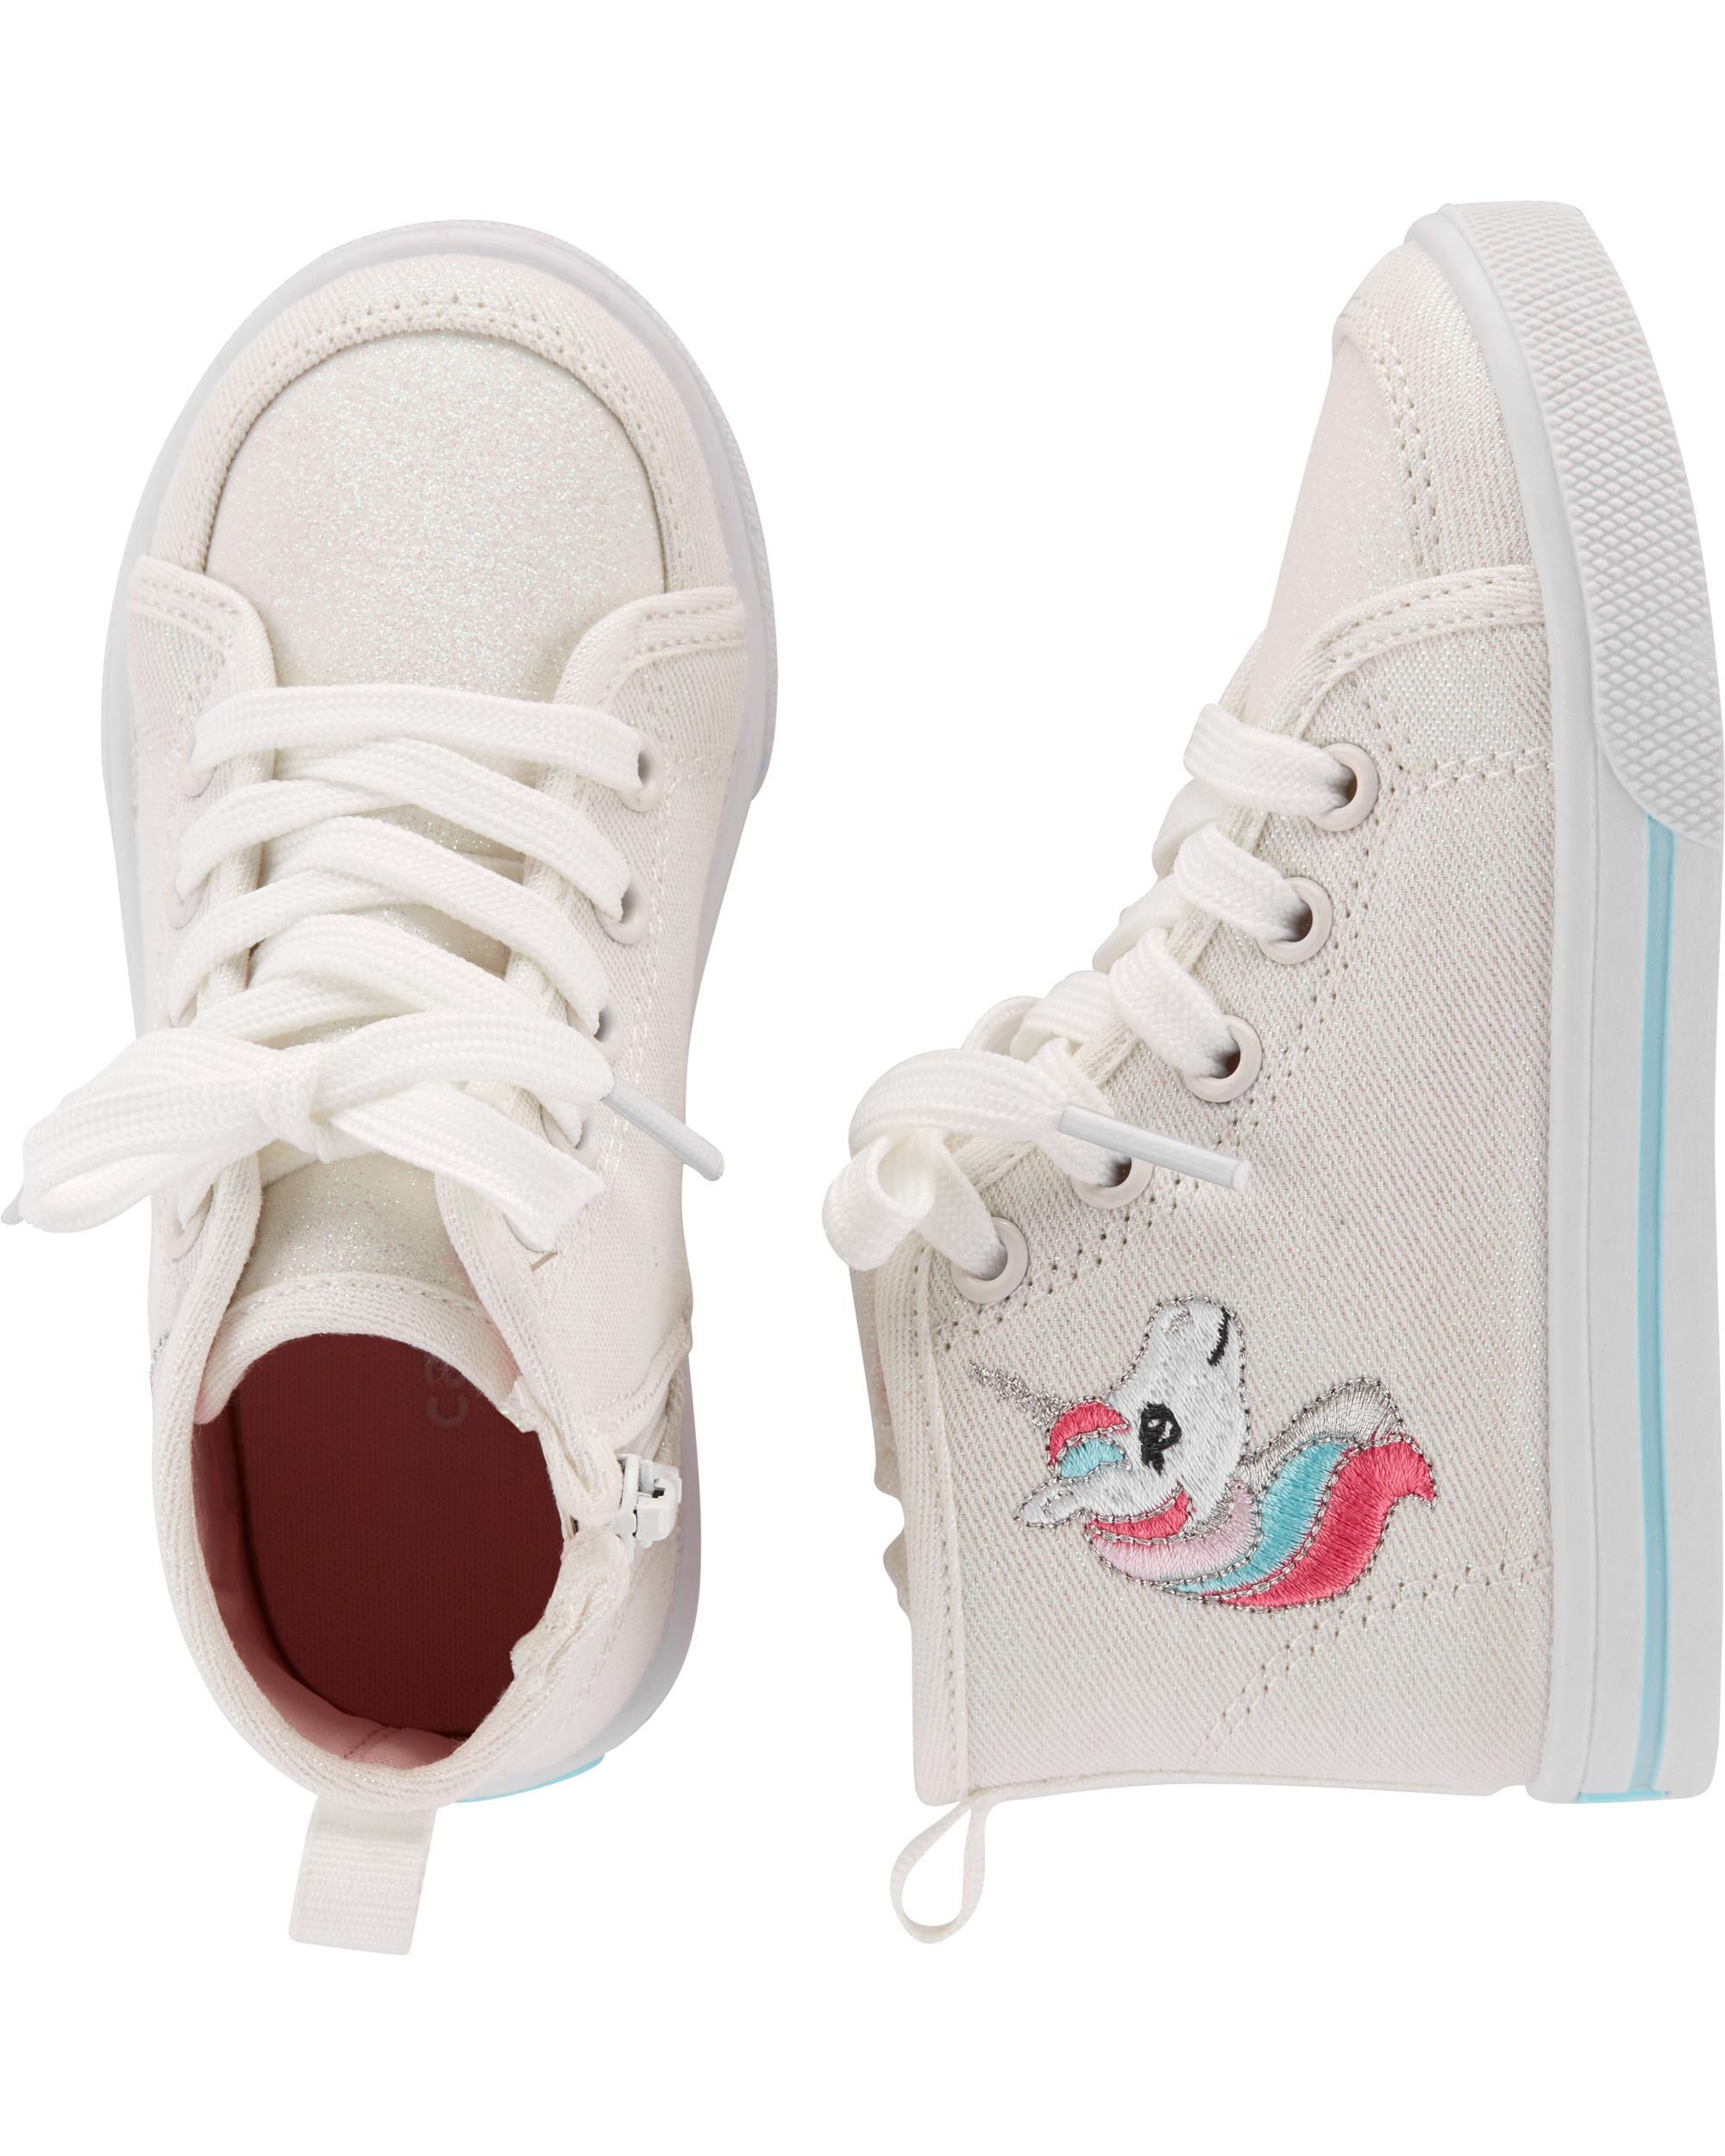 ccc021132776a Carter's Glitter Canvas Unicorn High Top Sneakers | Carters.com